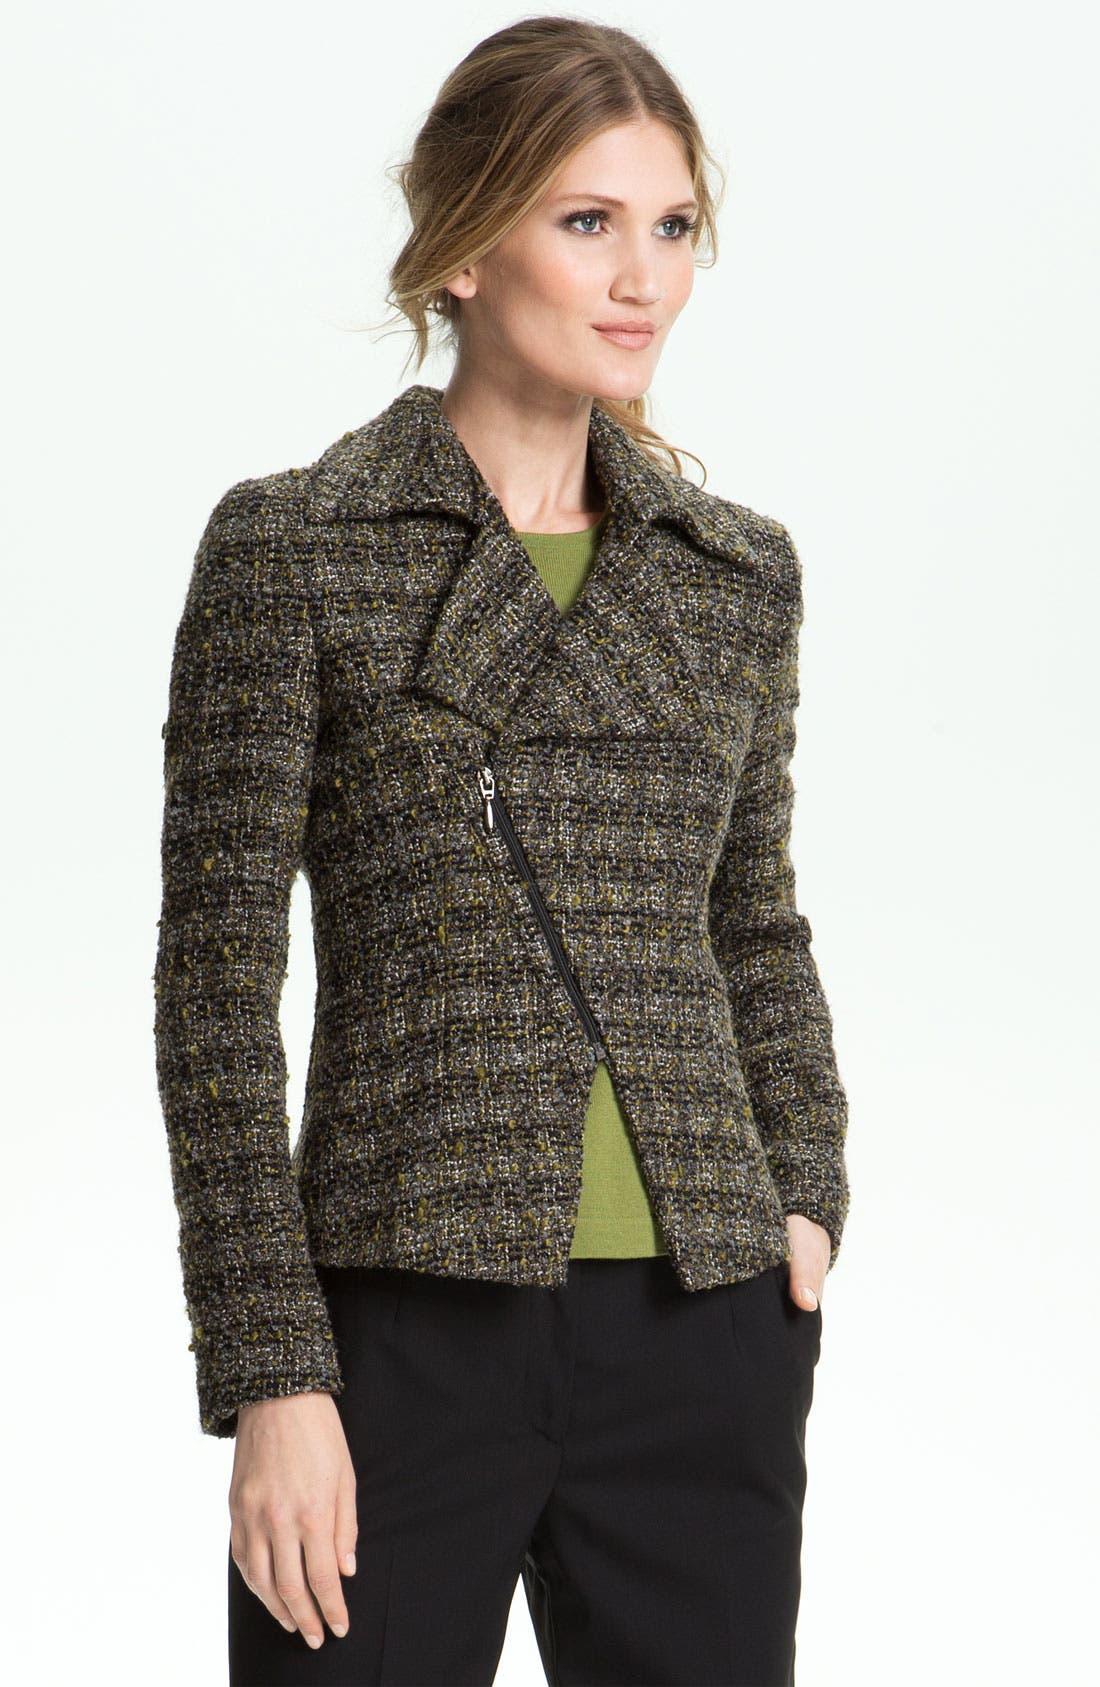 Alternate Image 1 Selected - Zanella 'Scarlett' Jacket